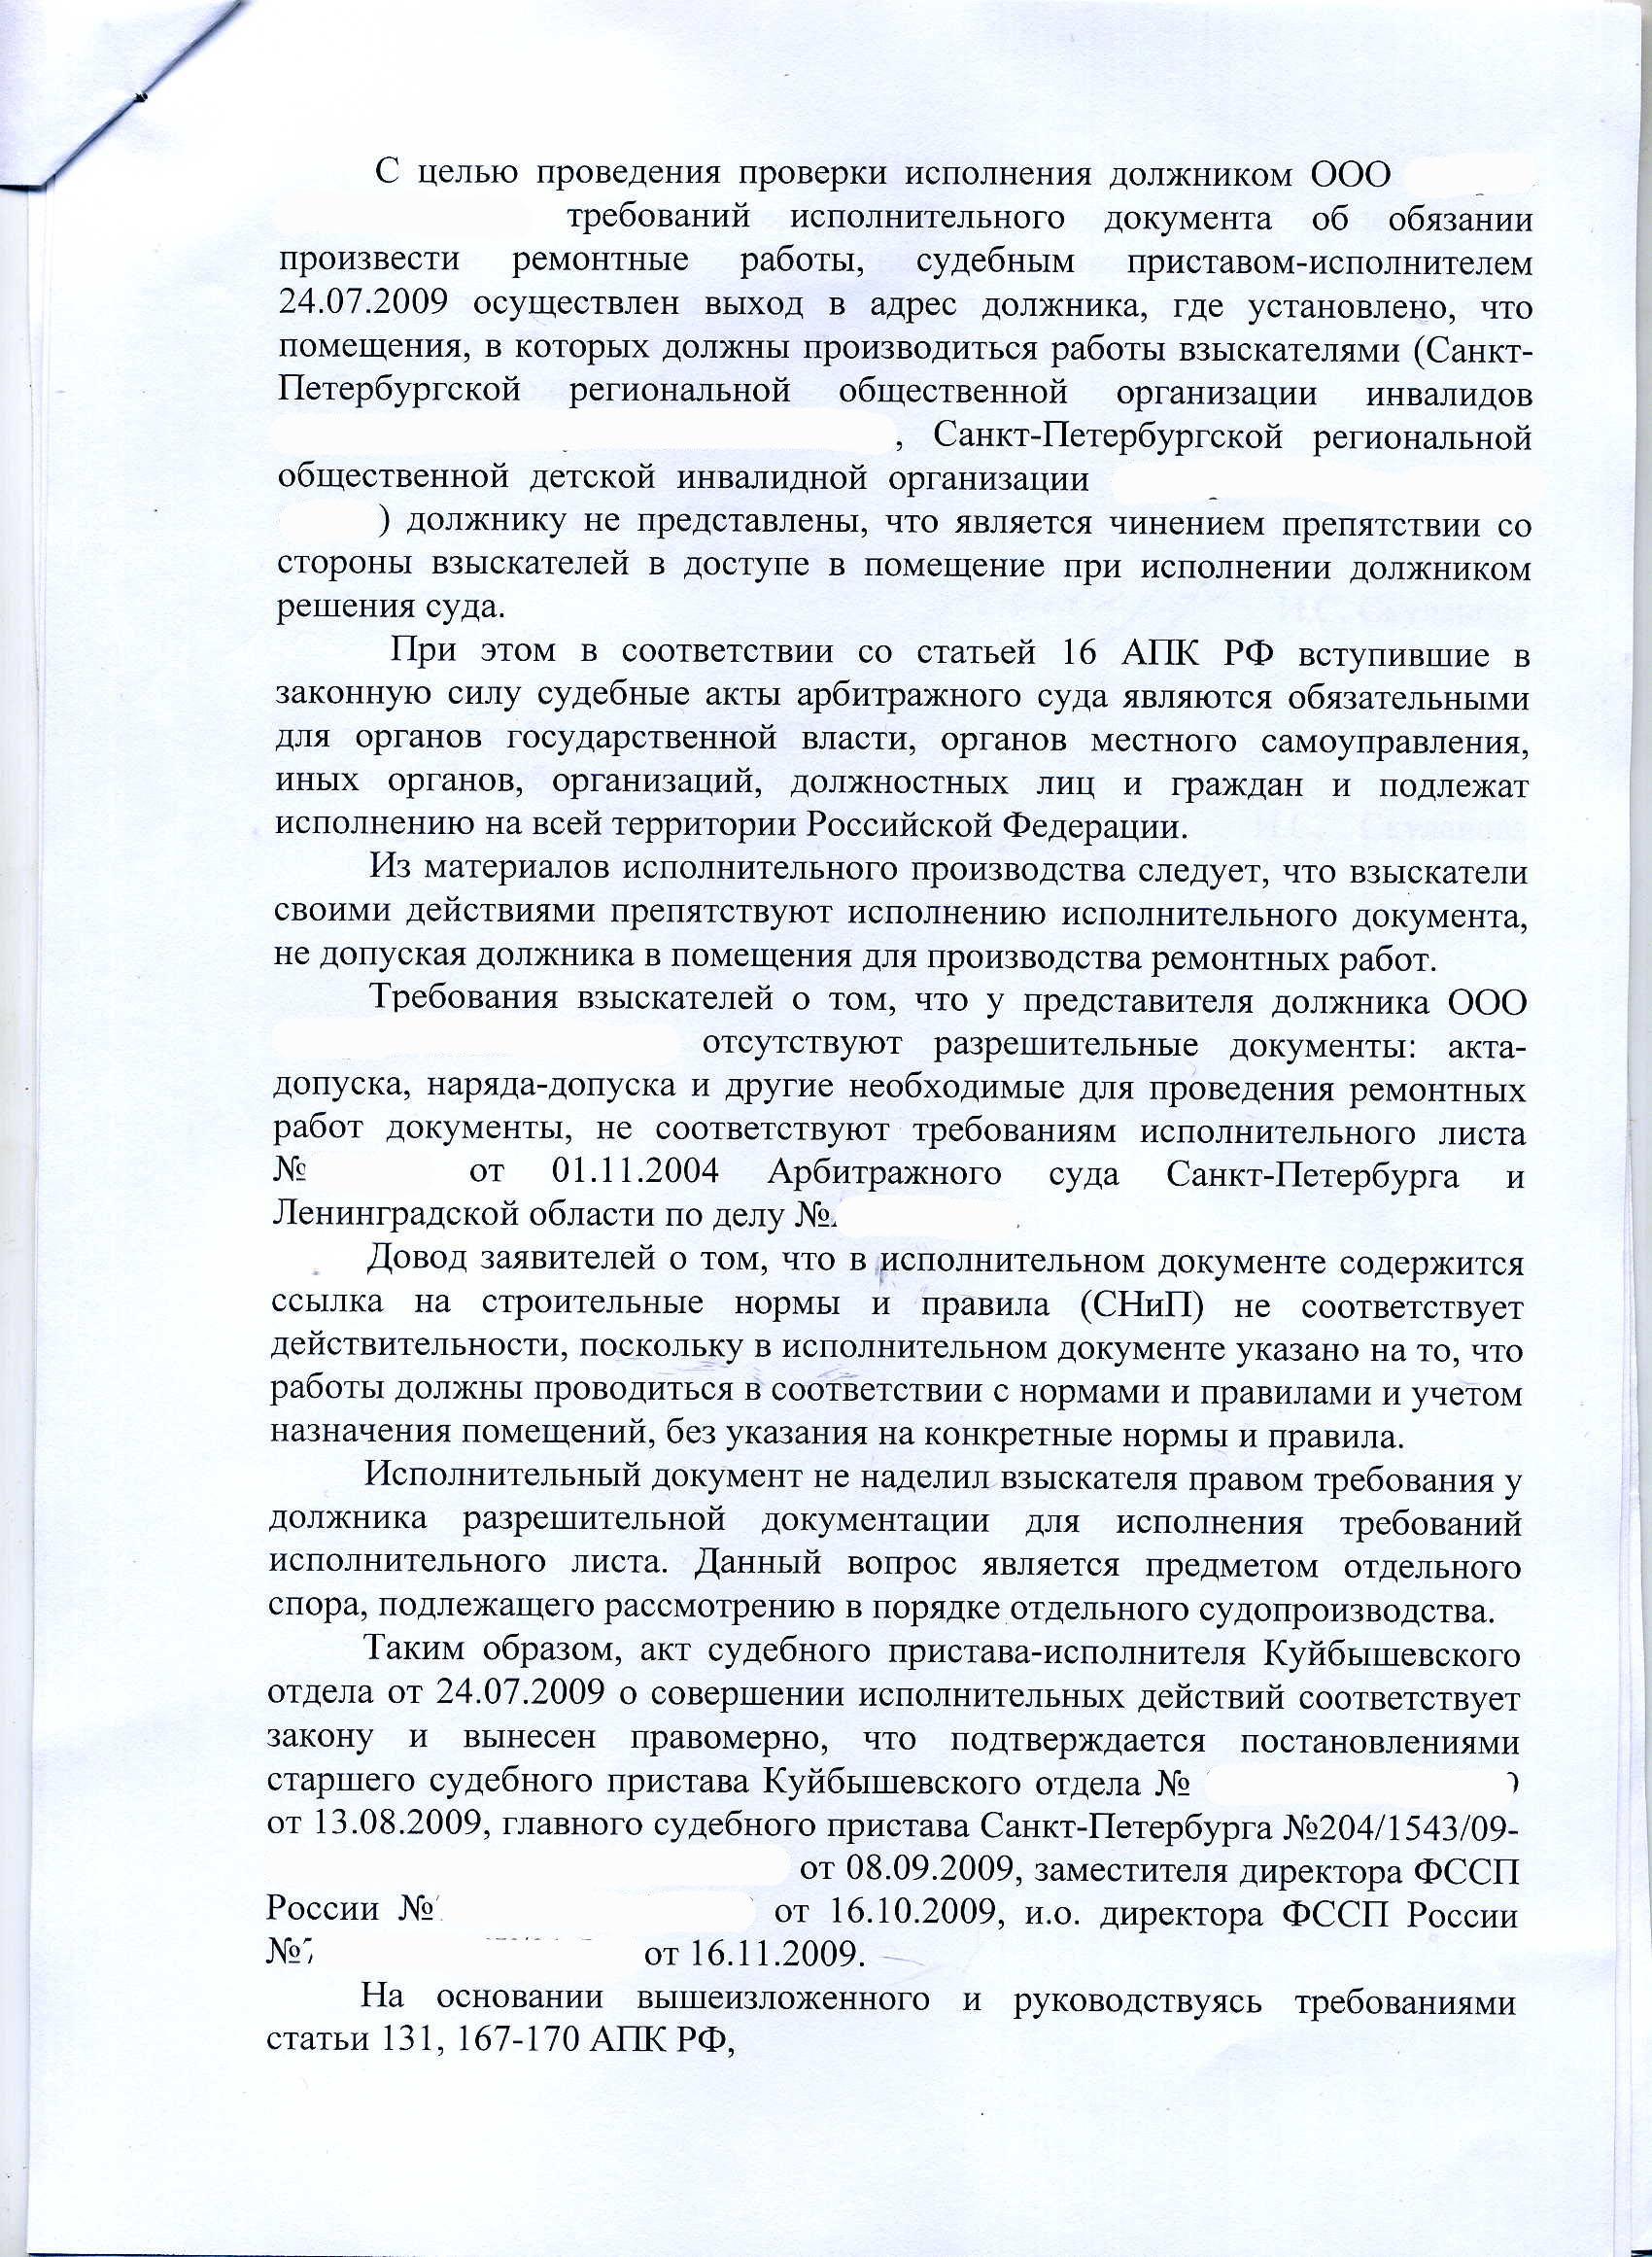 315 ук рф: